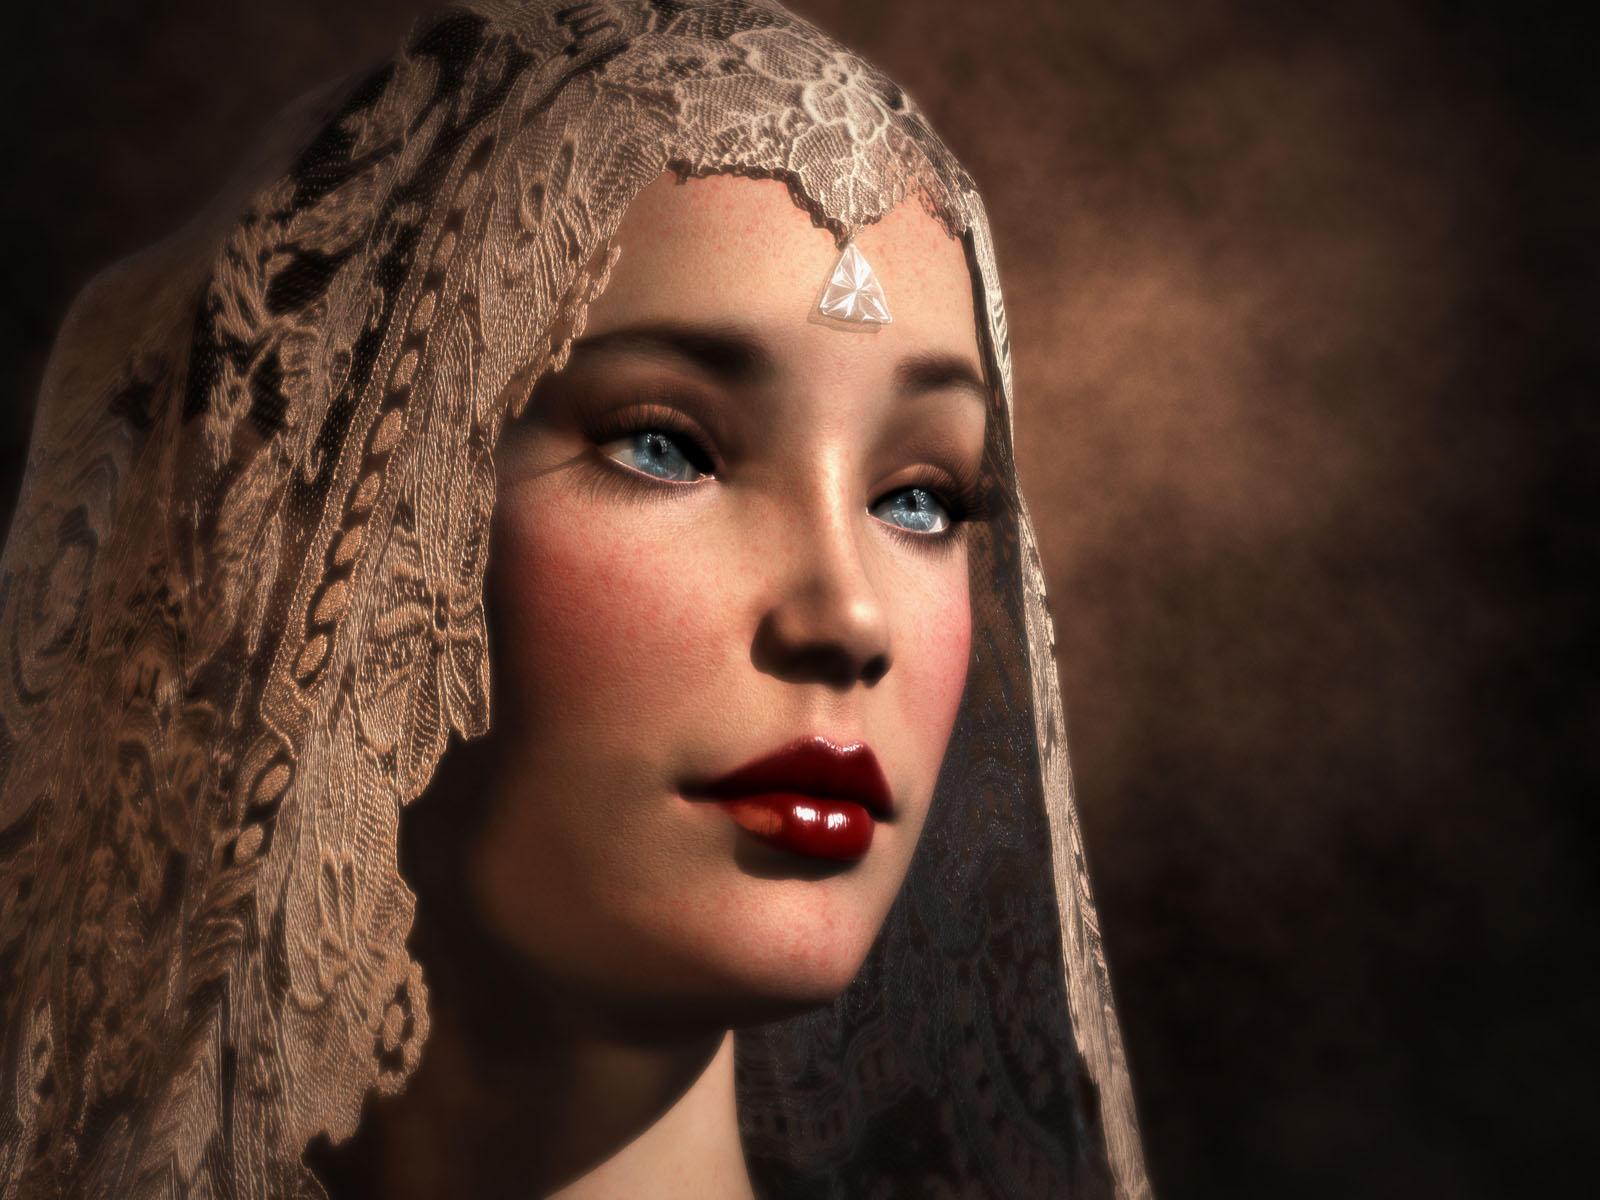 Irina II by Olivier050670